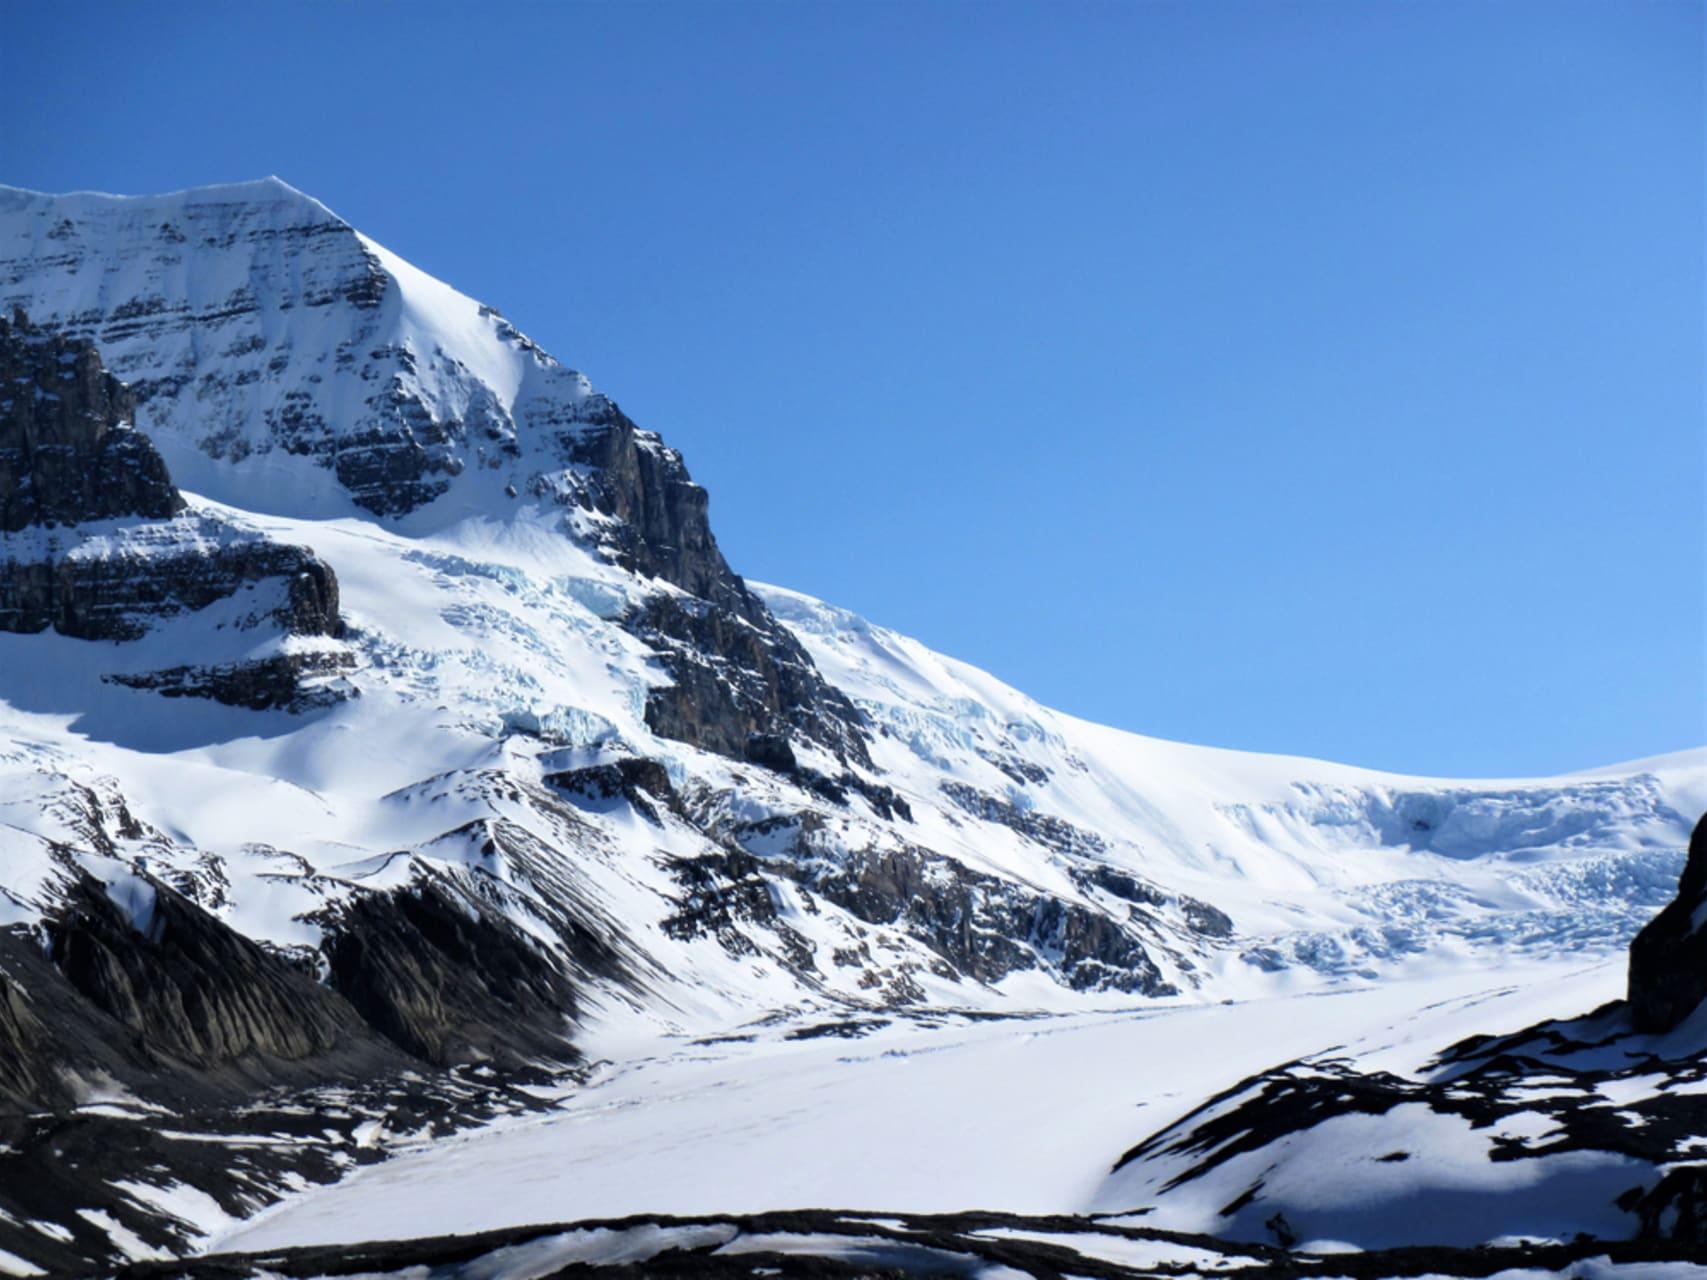 Jasper - The Columbia Icefields